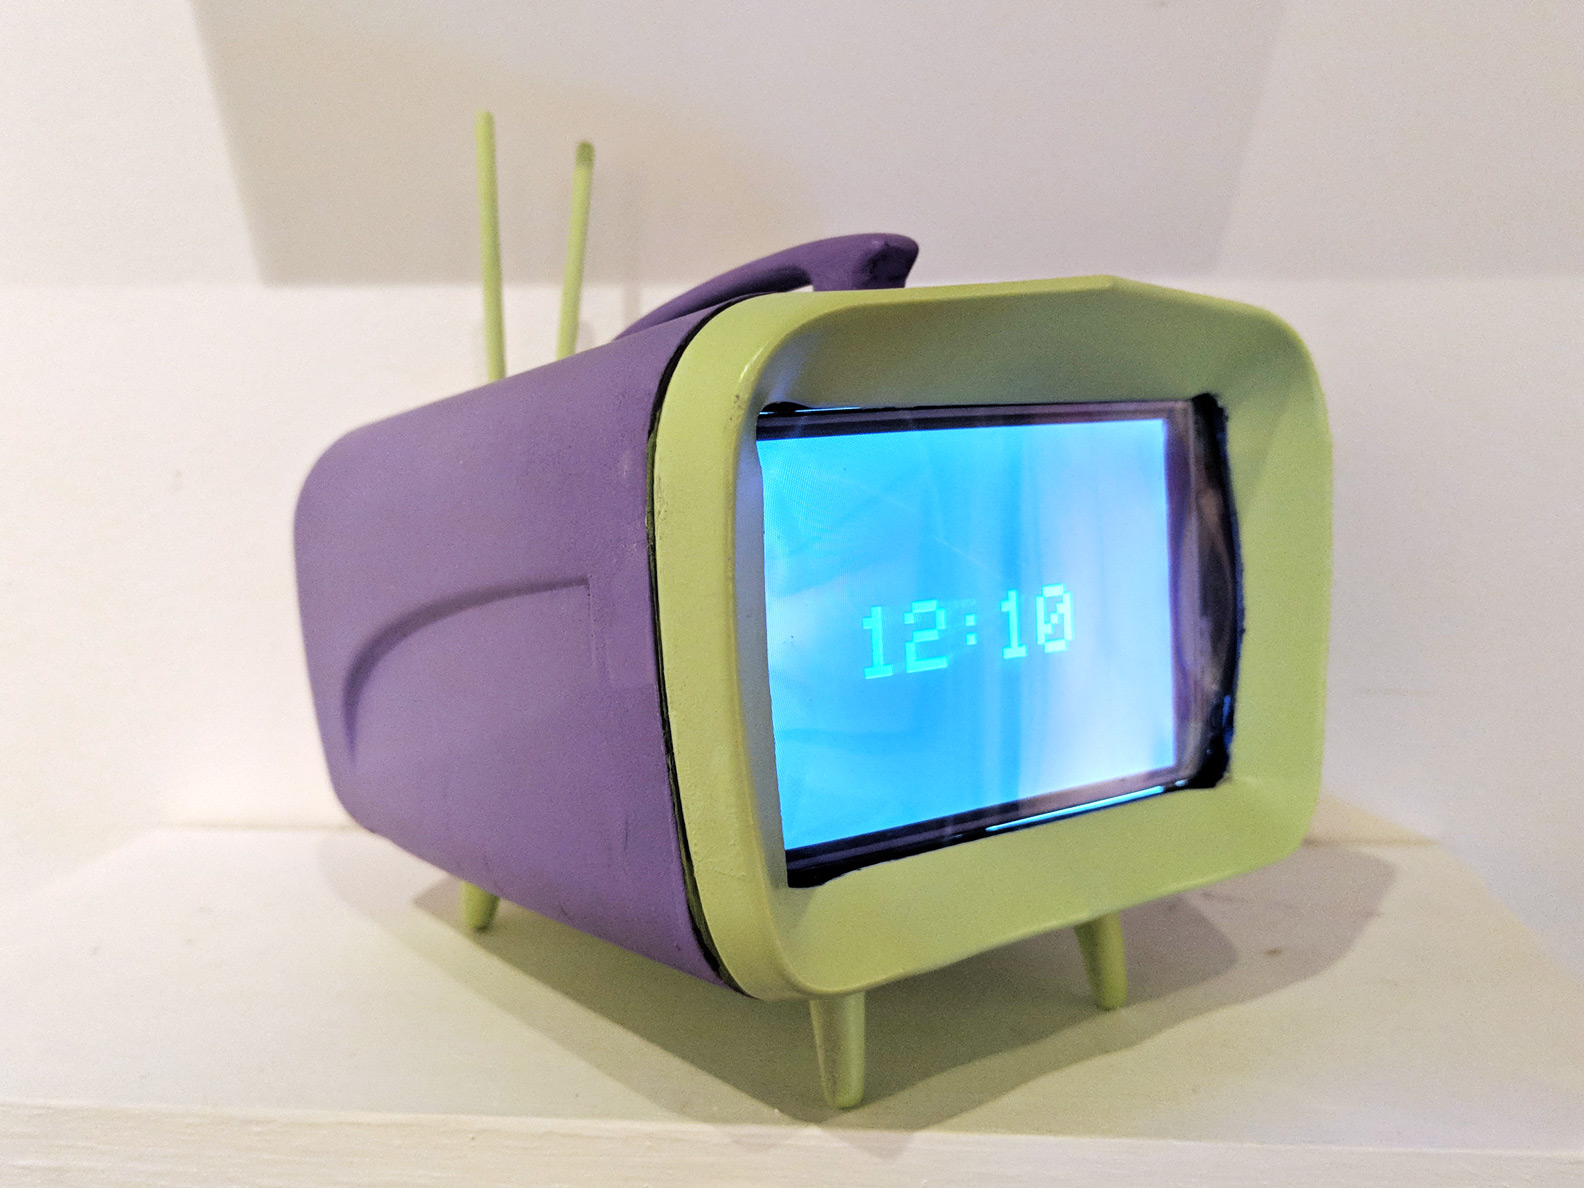 AtlTvHead   Model A AO4 (Green/Purple),    3D Printed PLA casing, LCD screen, ESP 32, 5.5 x 5.5 x 5 inches